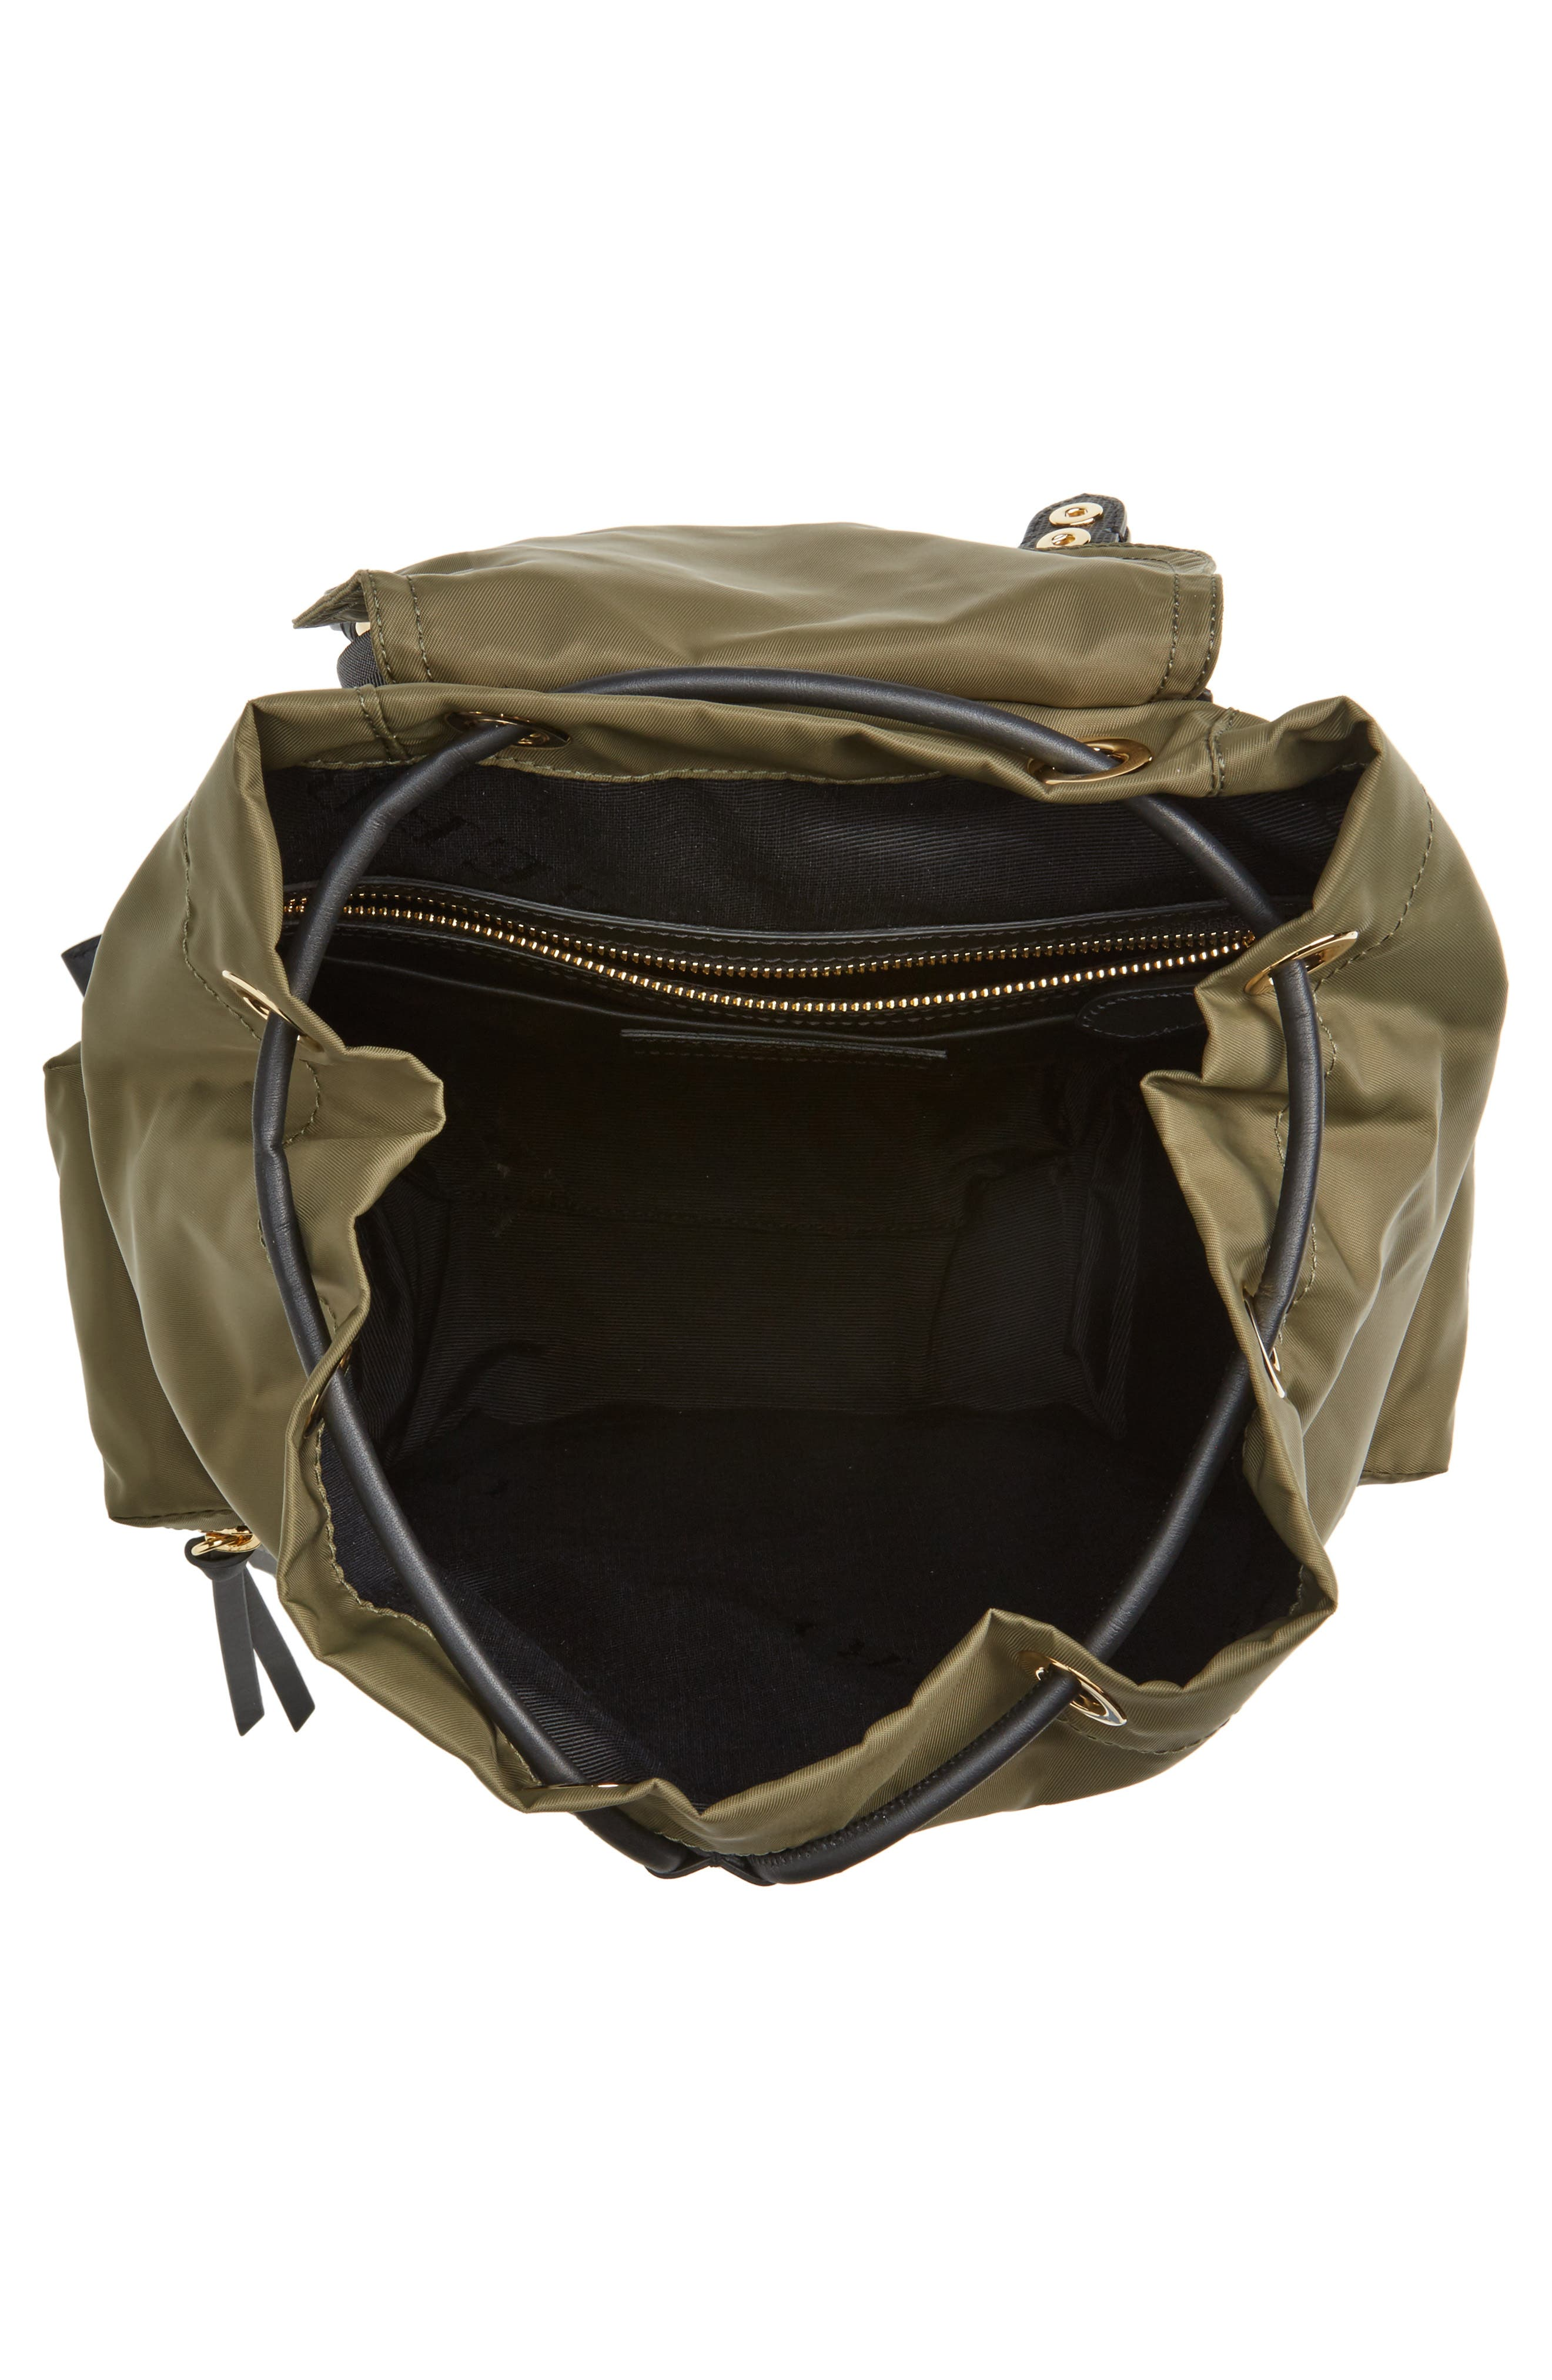 Medium Patches Rucksack Nylon Backpack,                             Alternate thumbnail 4, color,                             311